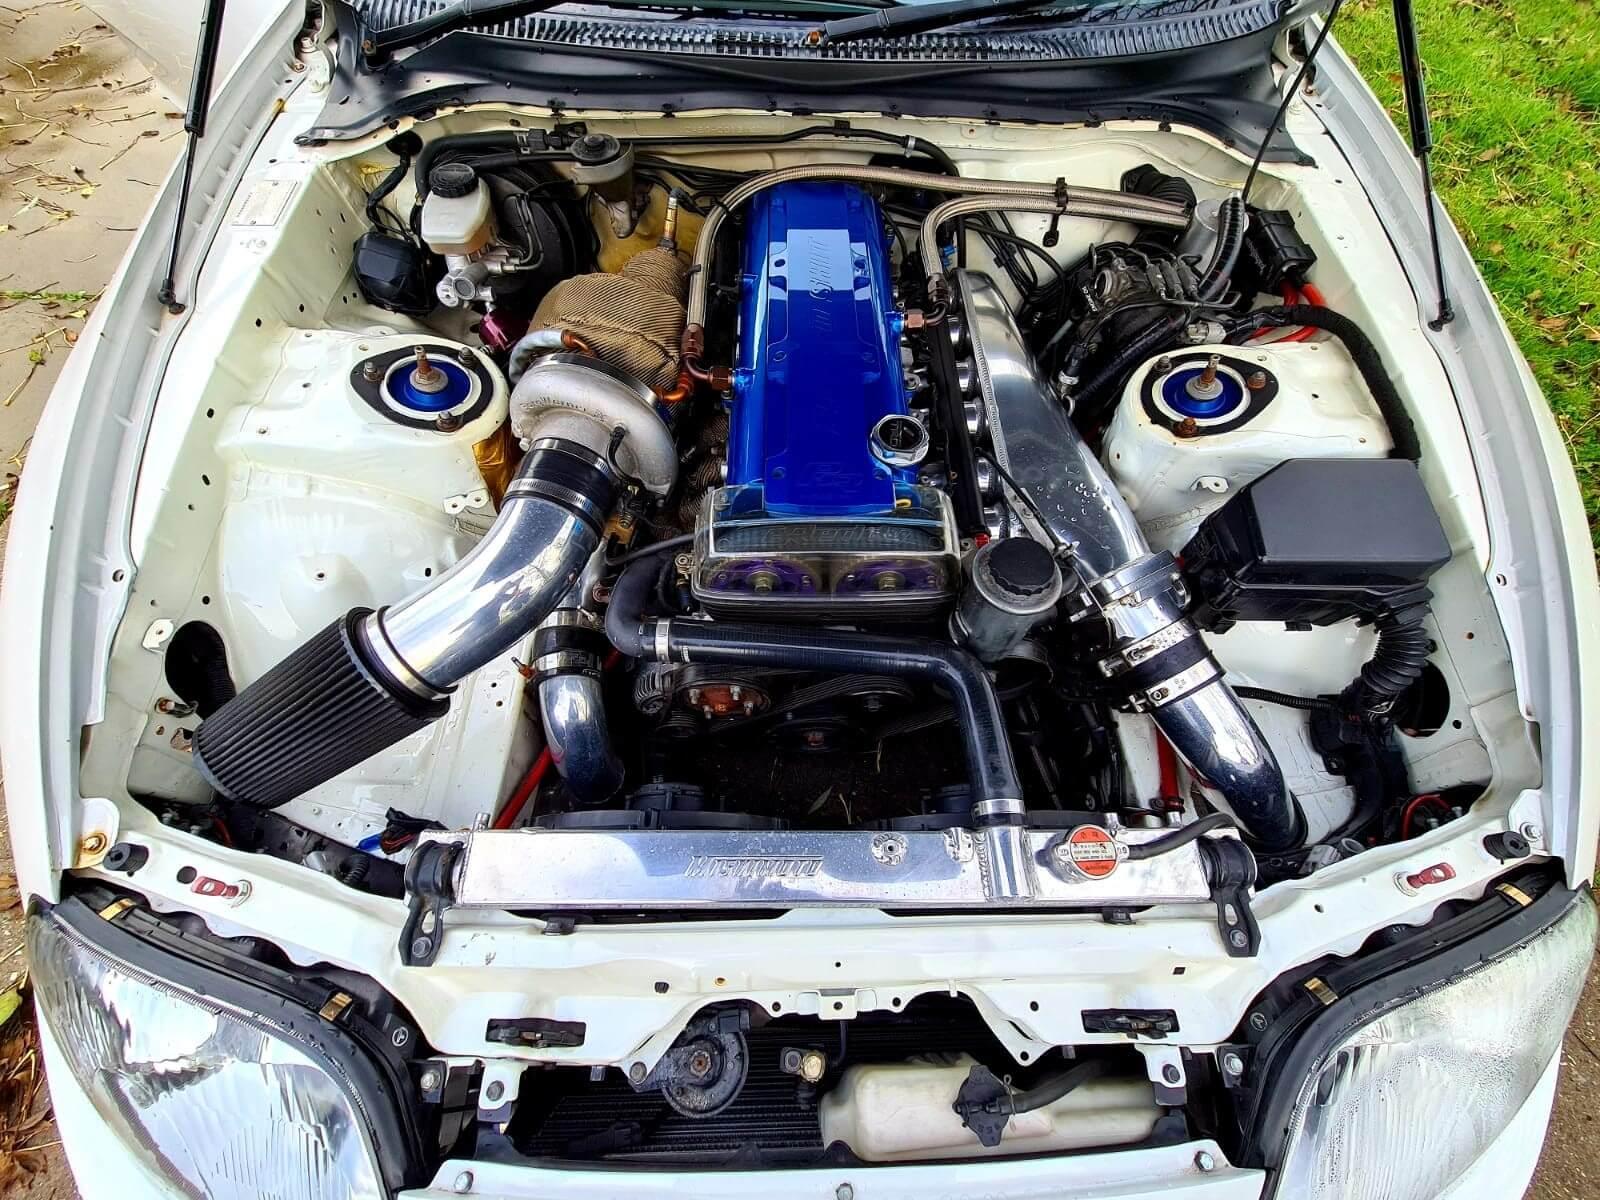 Toyota Supra Big Single turbo 950HP 7